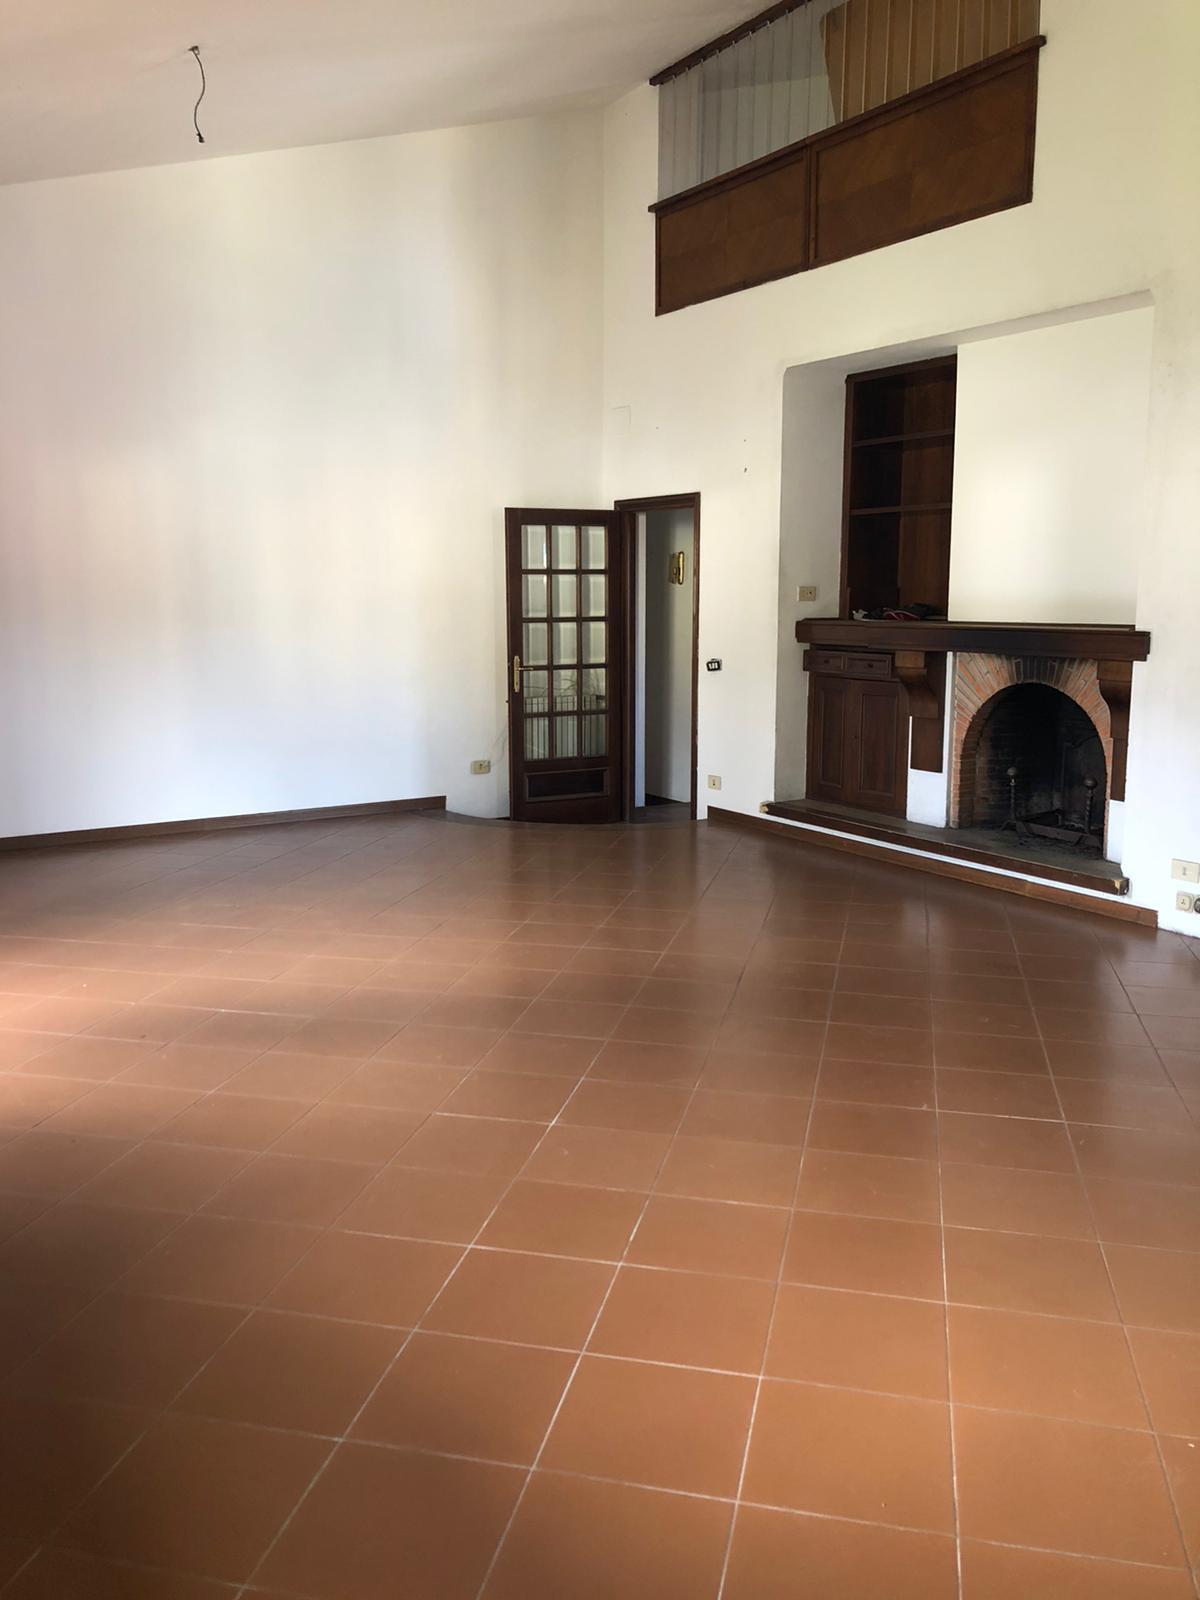 Villetta bifamiliare in vendita a Massarosa (LU)